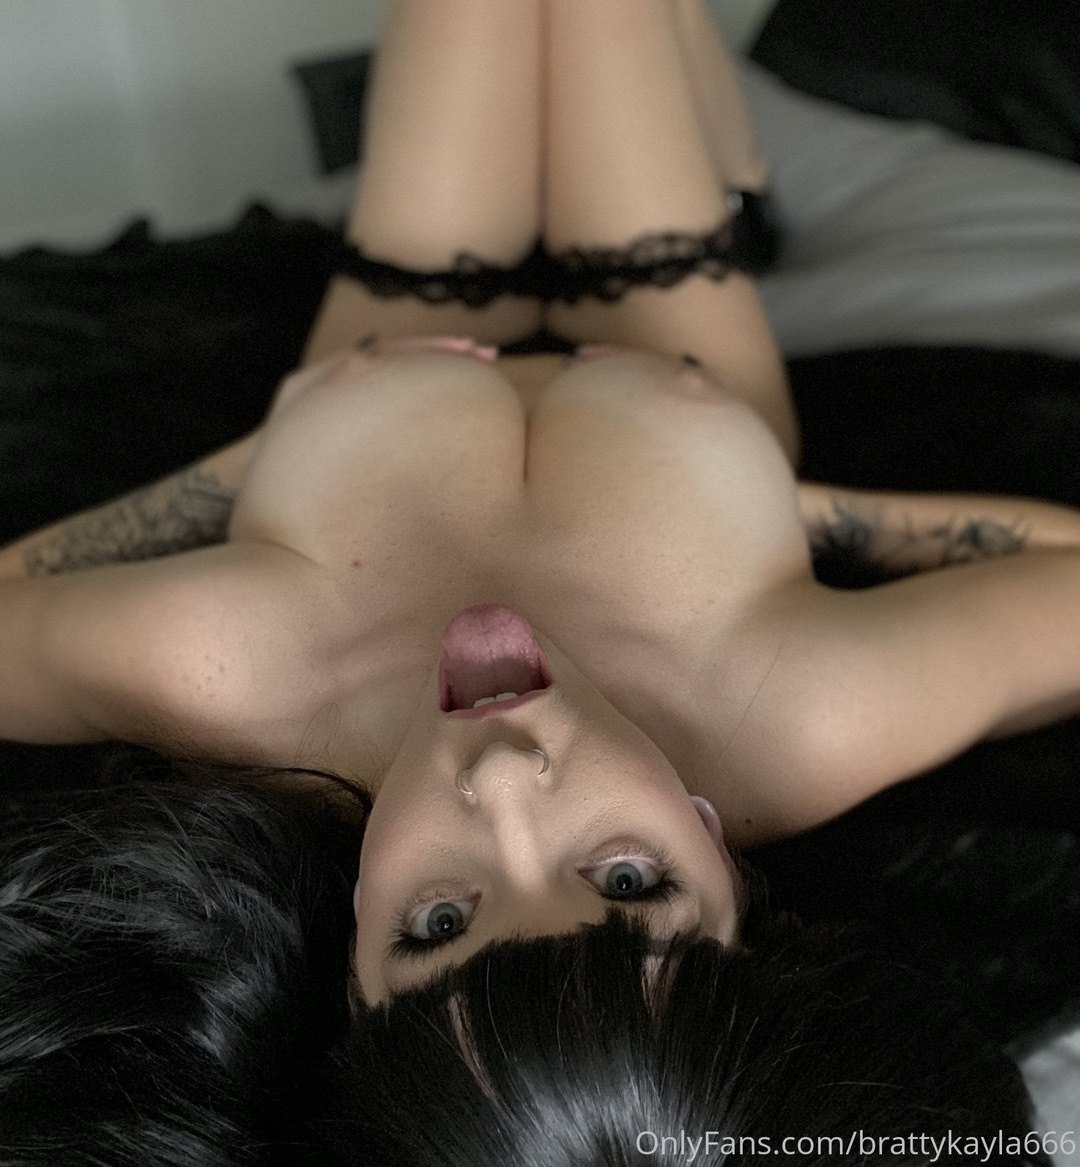 Bratty Kayla Brattykayla666 Onlyfans Nudes Leaks 0013